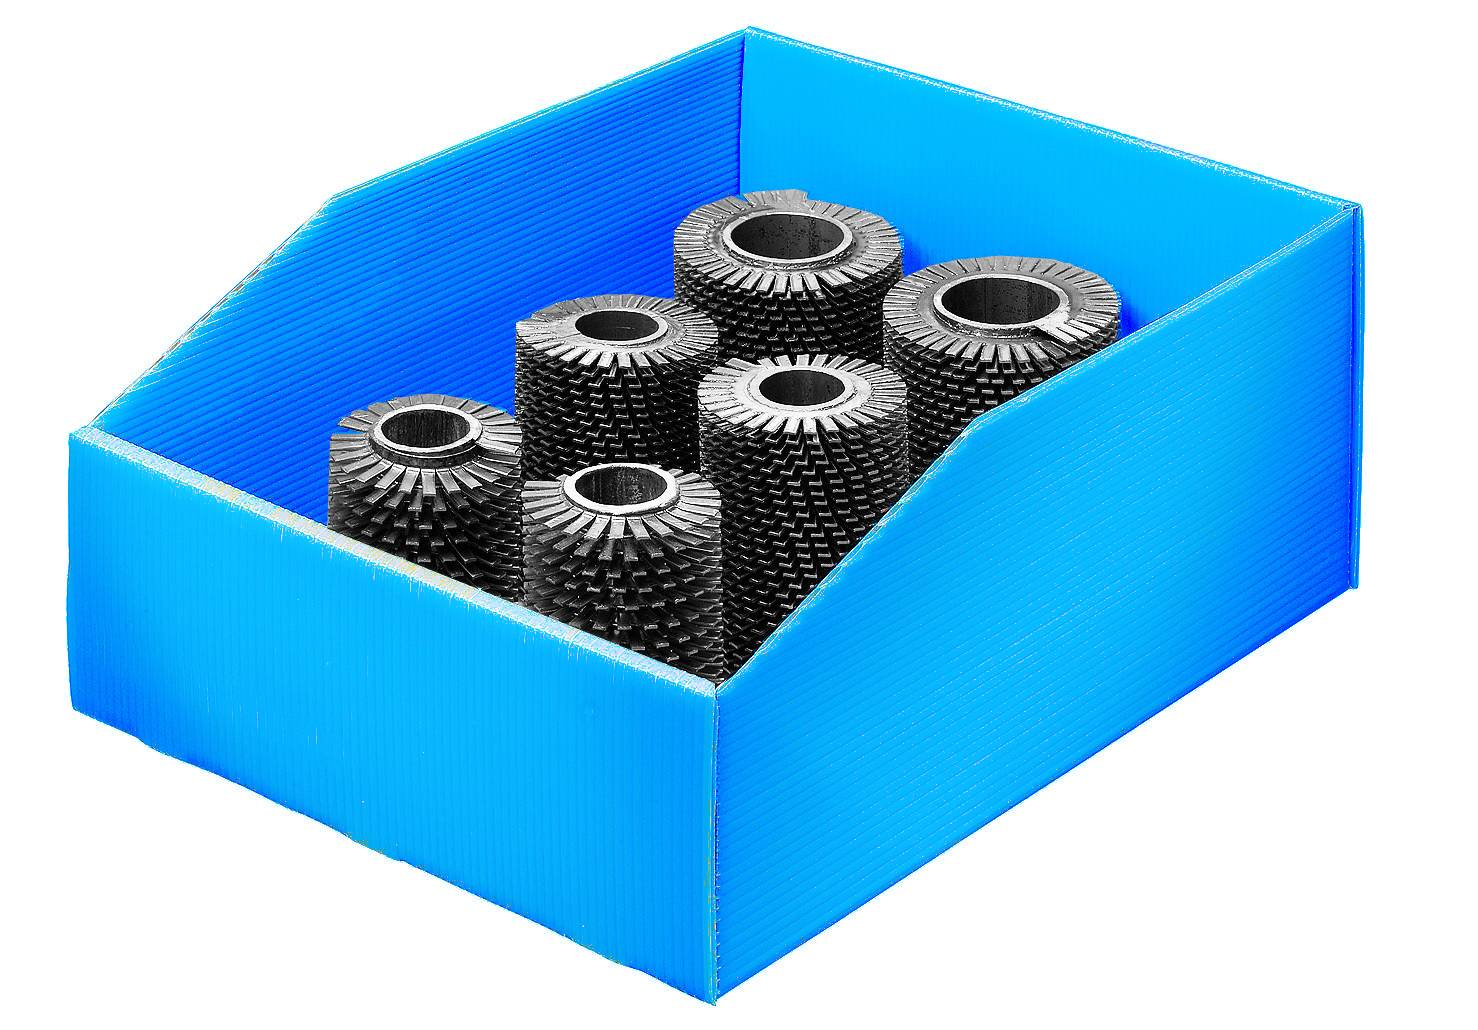 SETAM Bac pas cher polypropylène 17 litres bleu